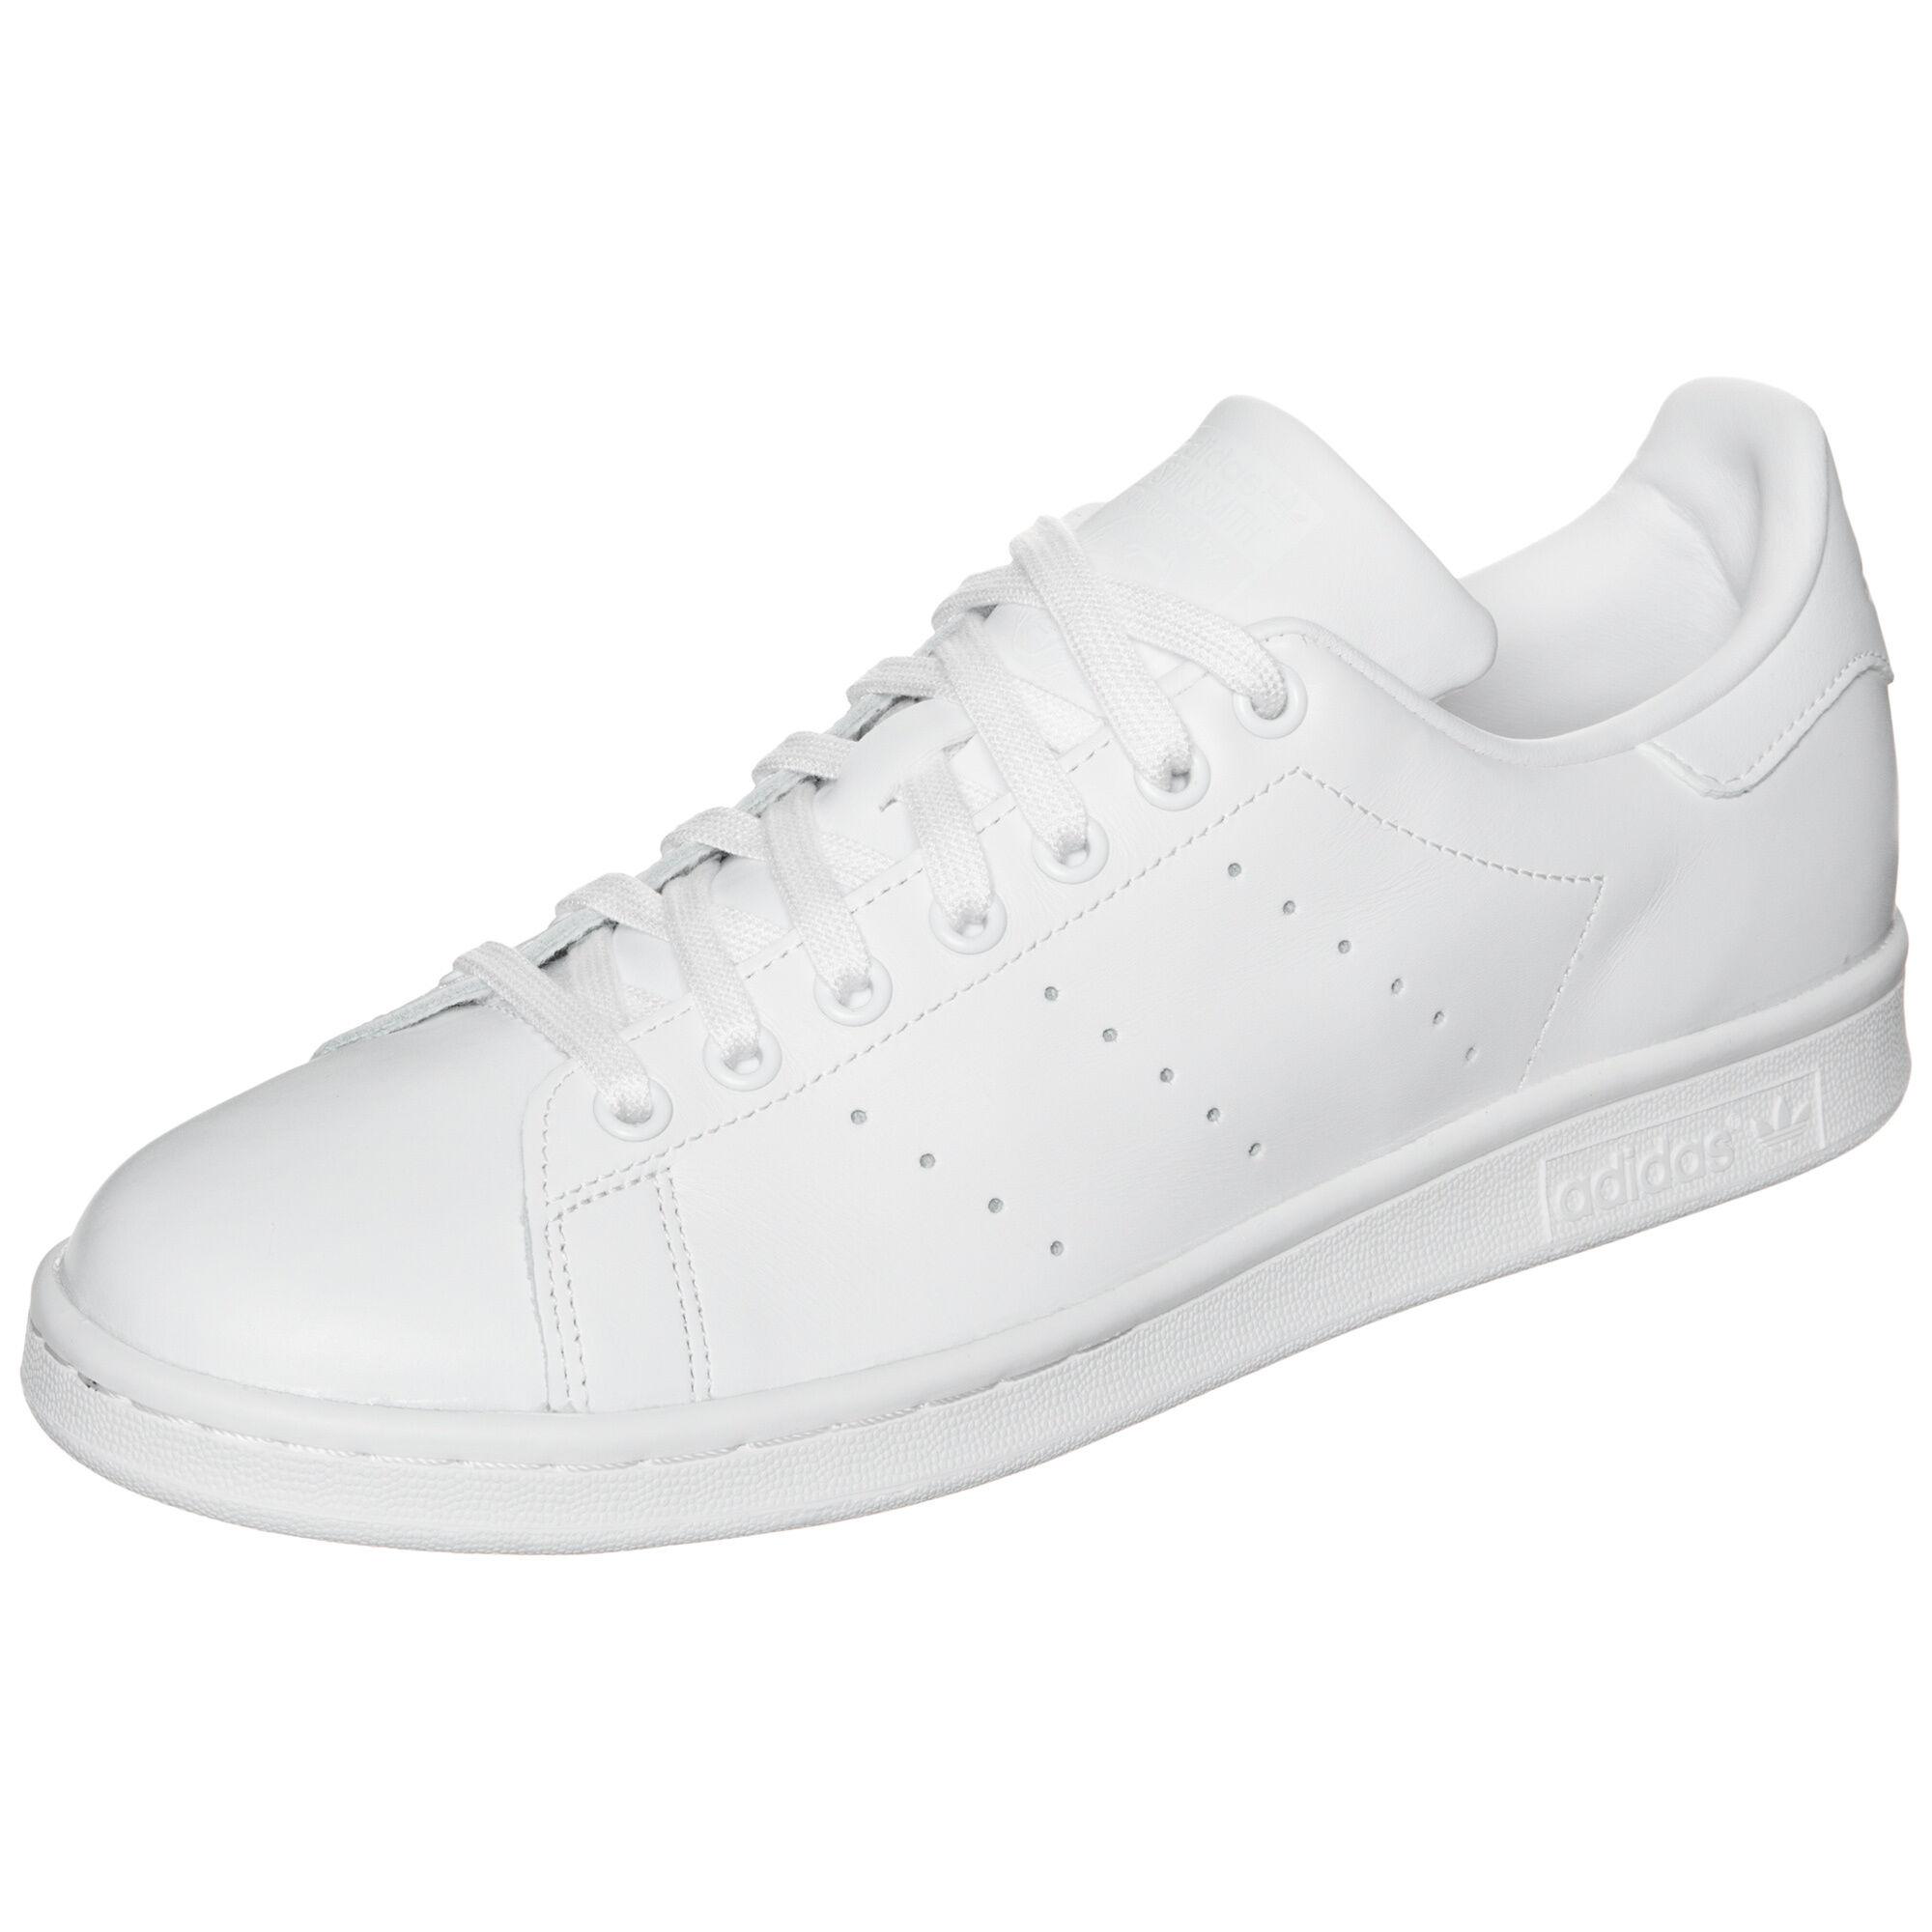 adidas stan smith damen 43 weiß